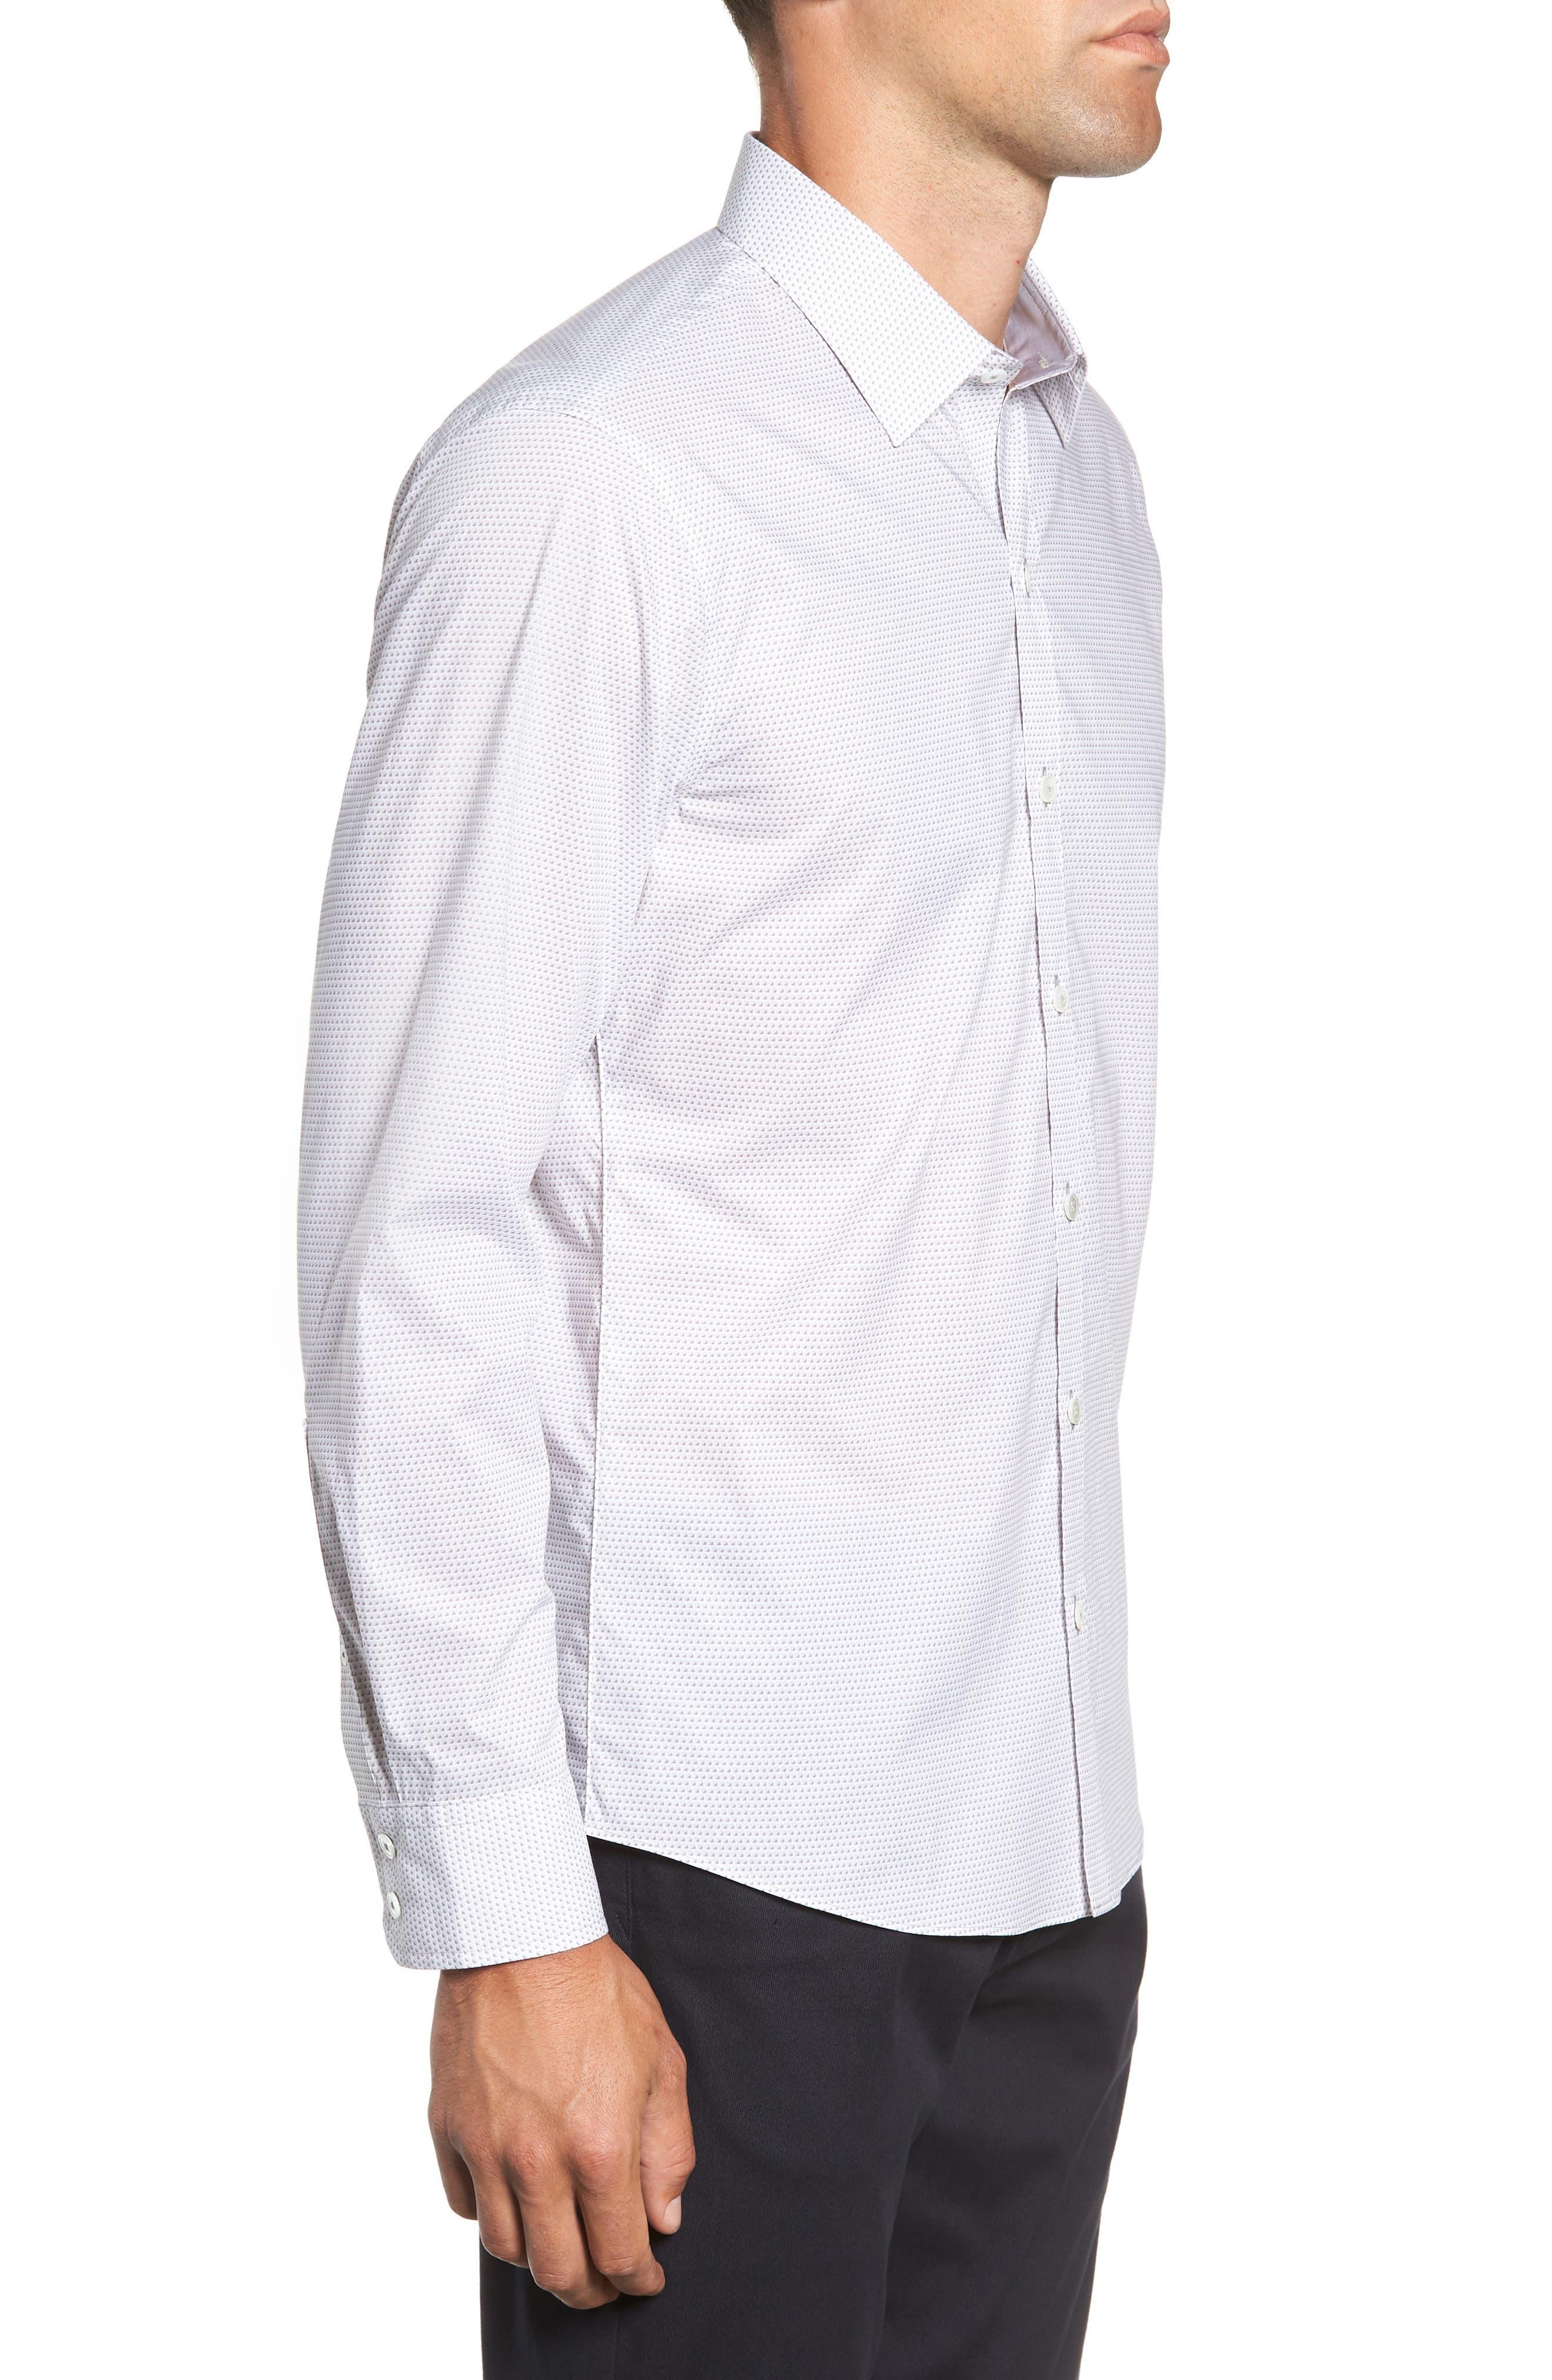 Toledo Regular Fit Microdot Sport Shirt,                             Alternate thumbnail 4, color,                             WHITE